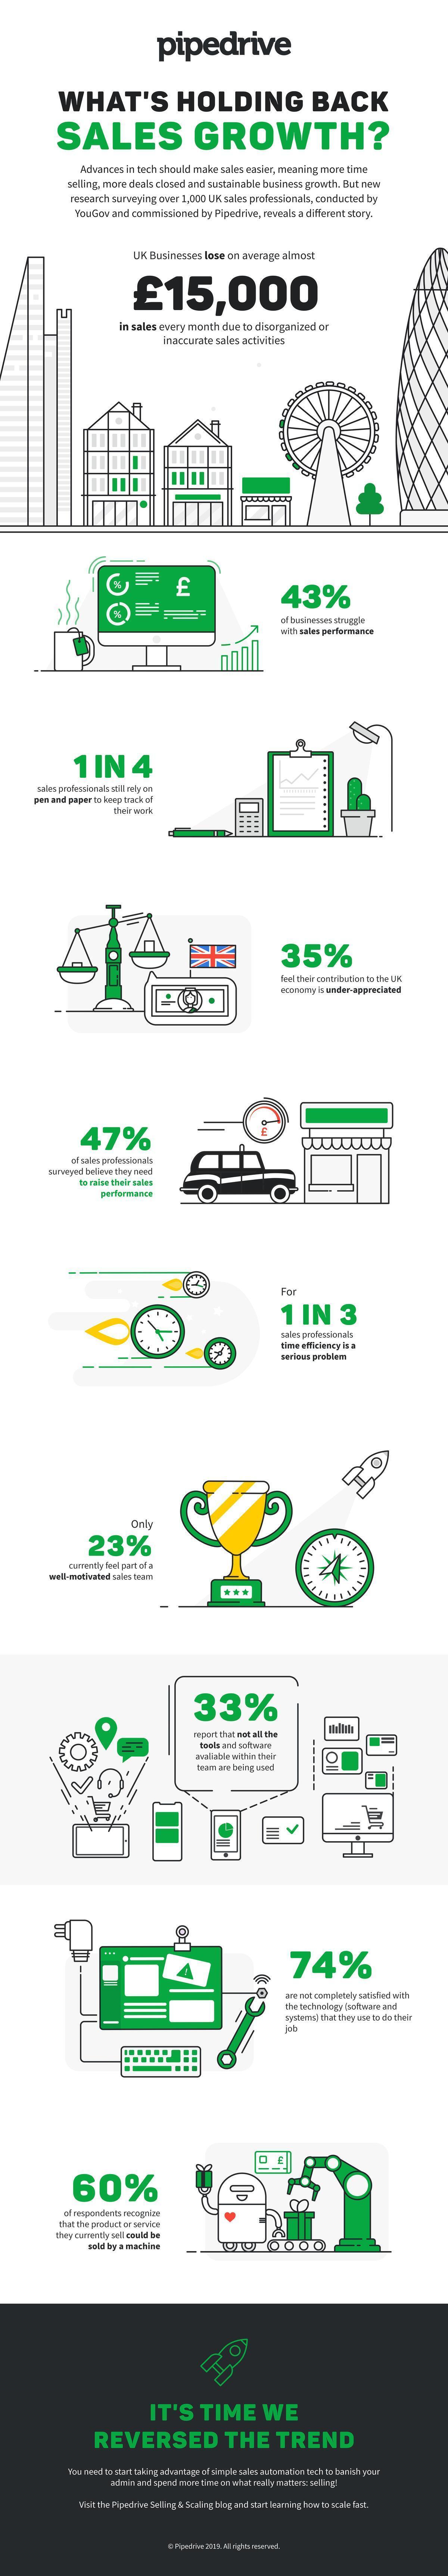 uk smb sales infographic